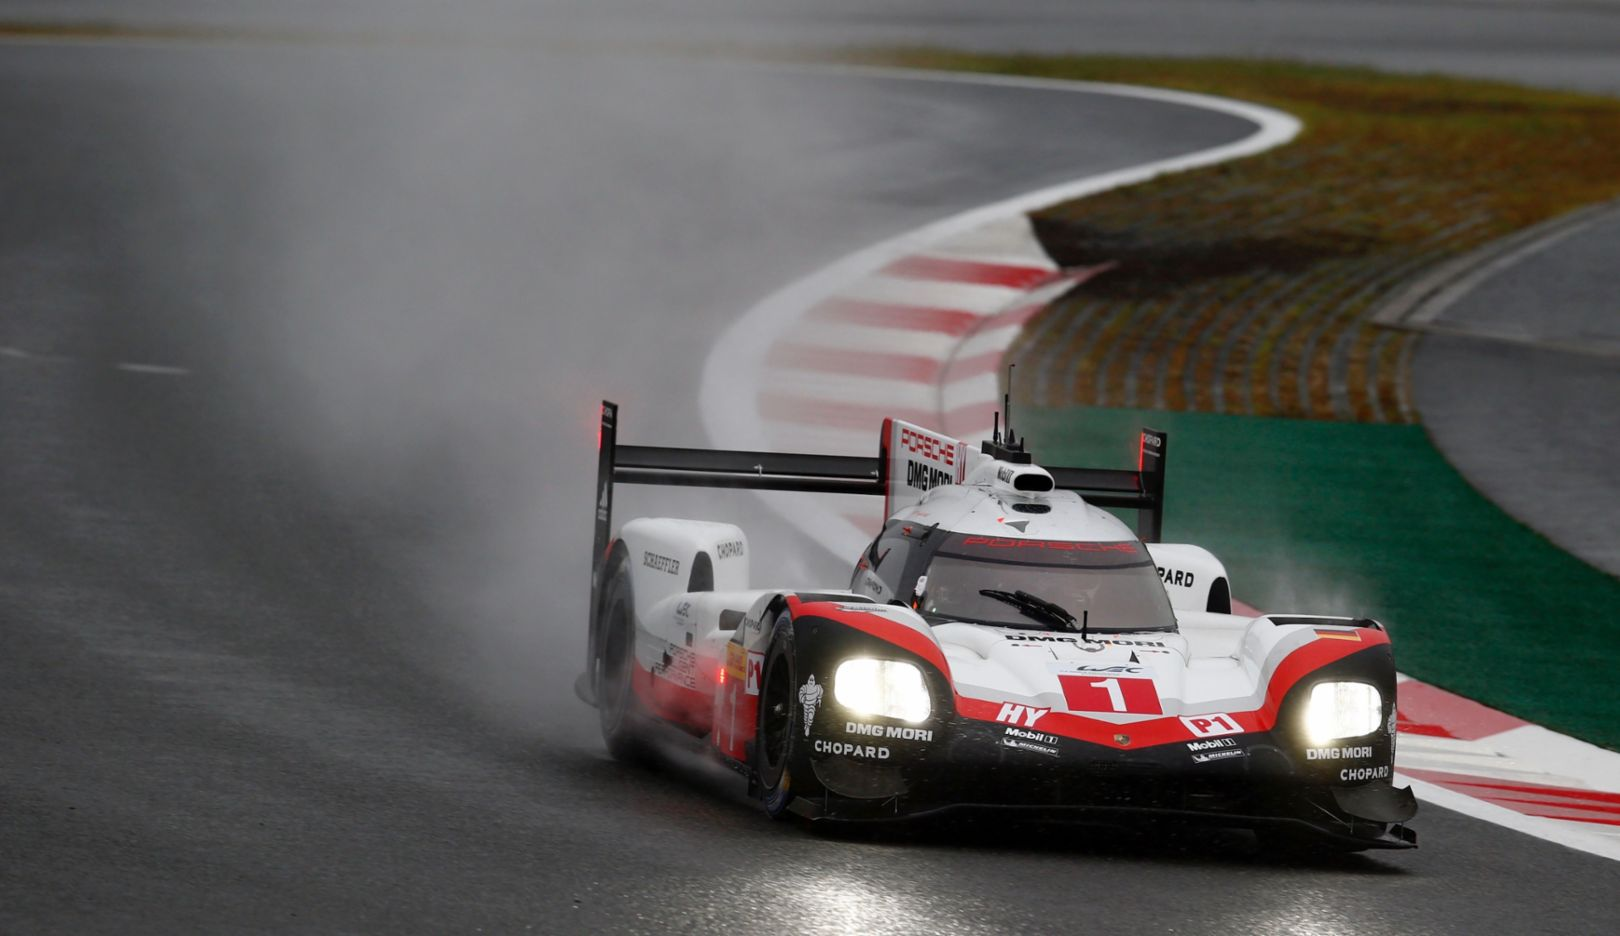 919 Hybrid, Neel Jani, Andre Lotterer, Nick Tandy, freies Training, WEC, Fuji, 2017, Porsche AG